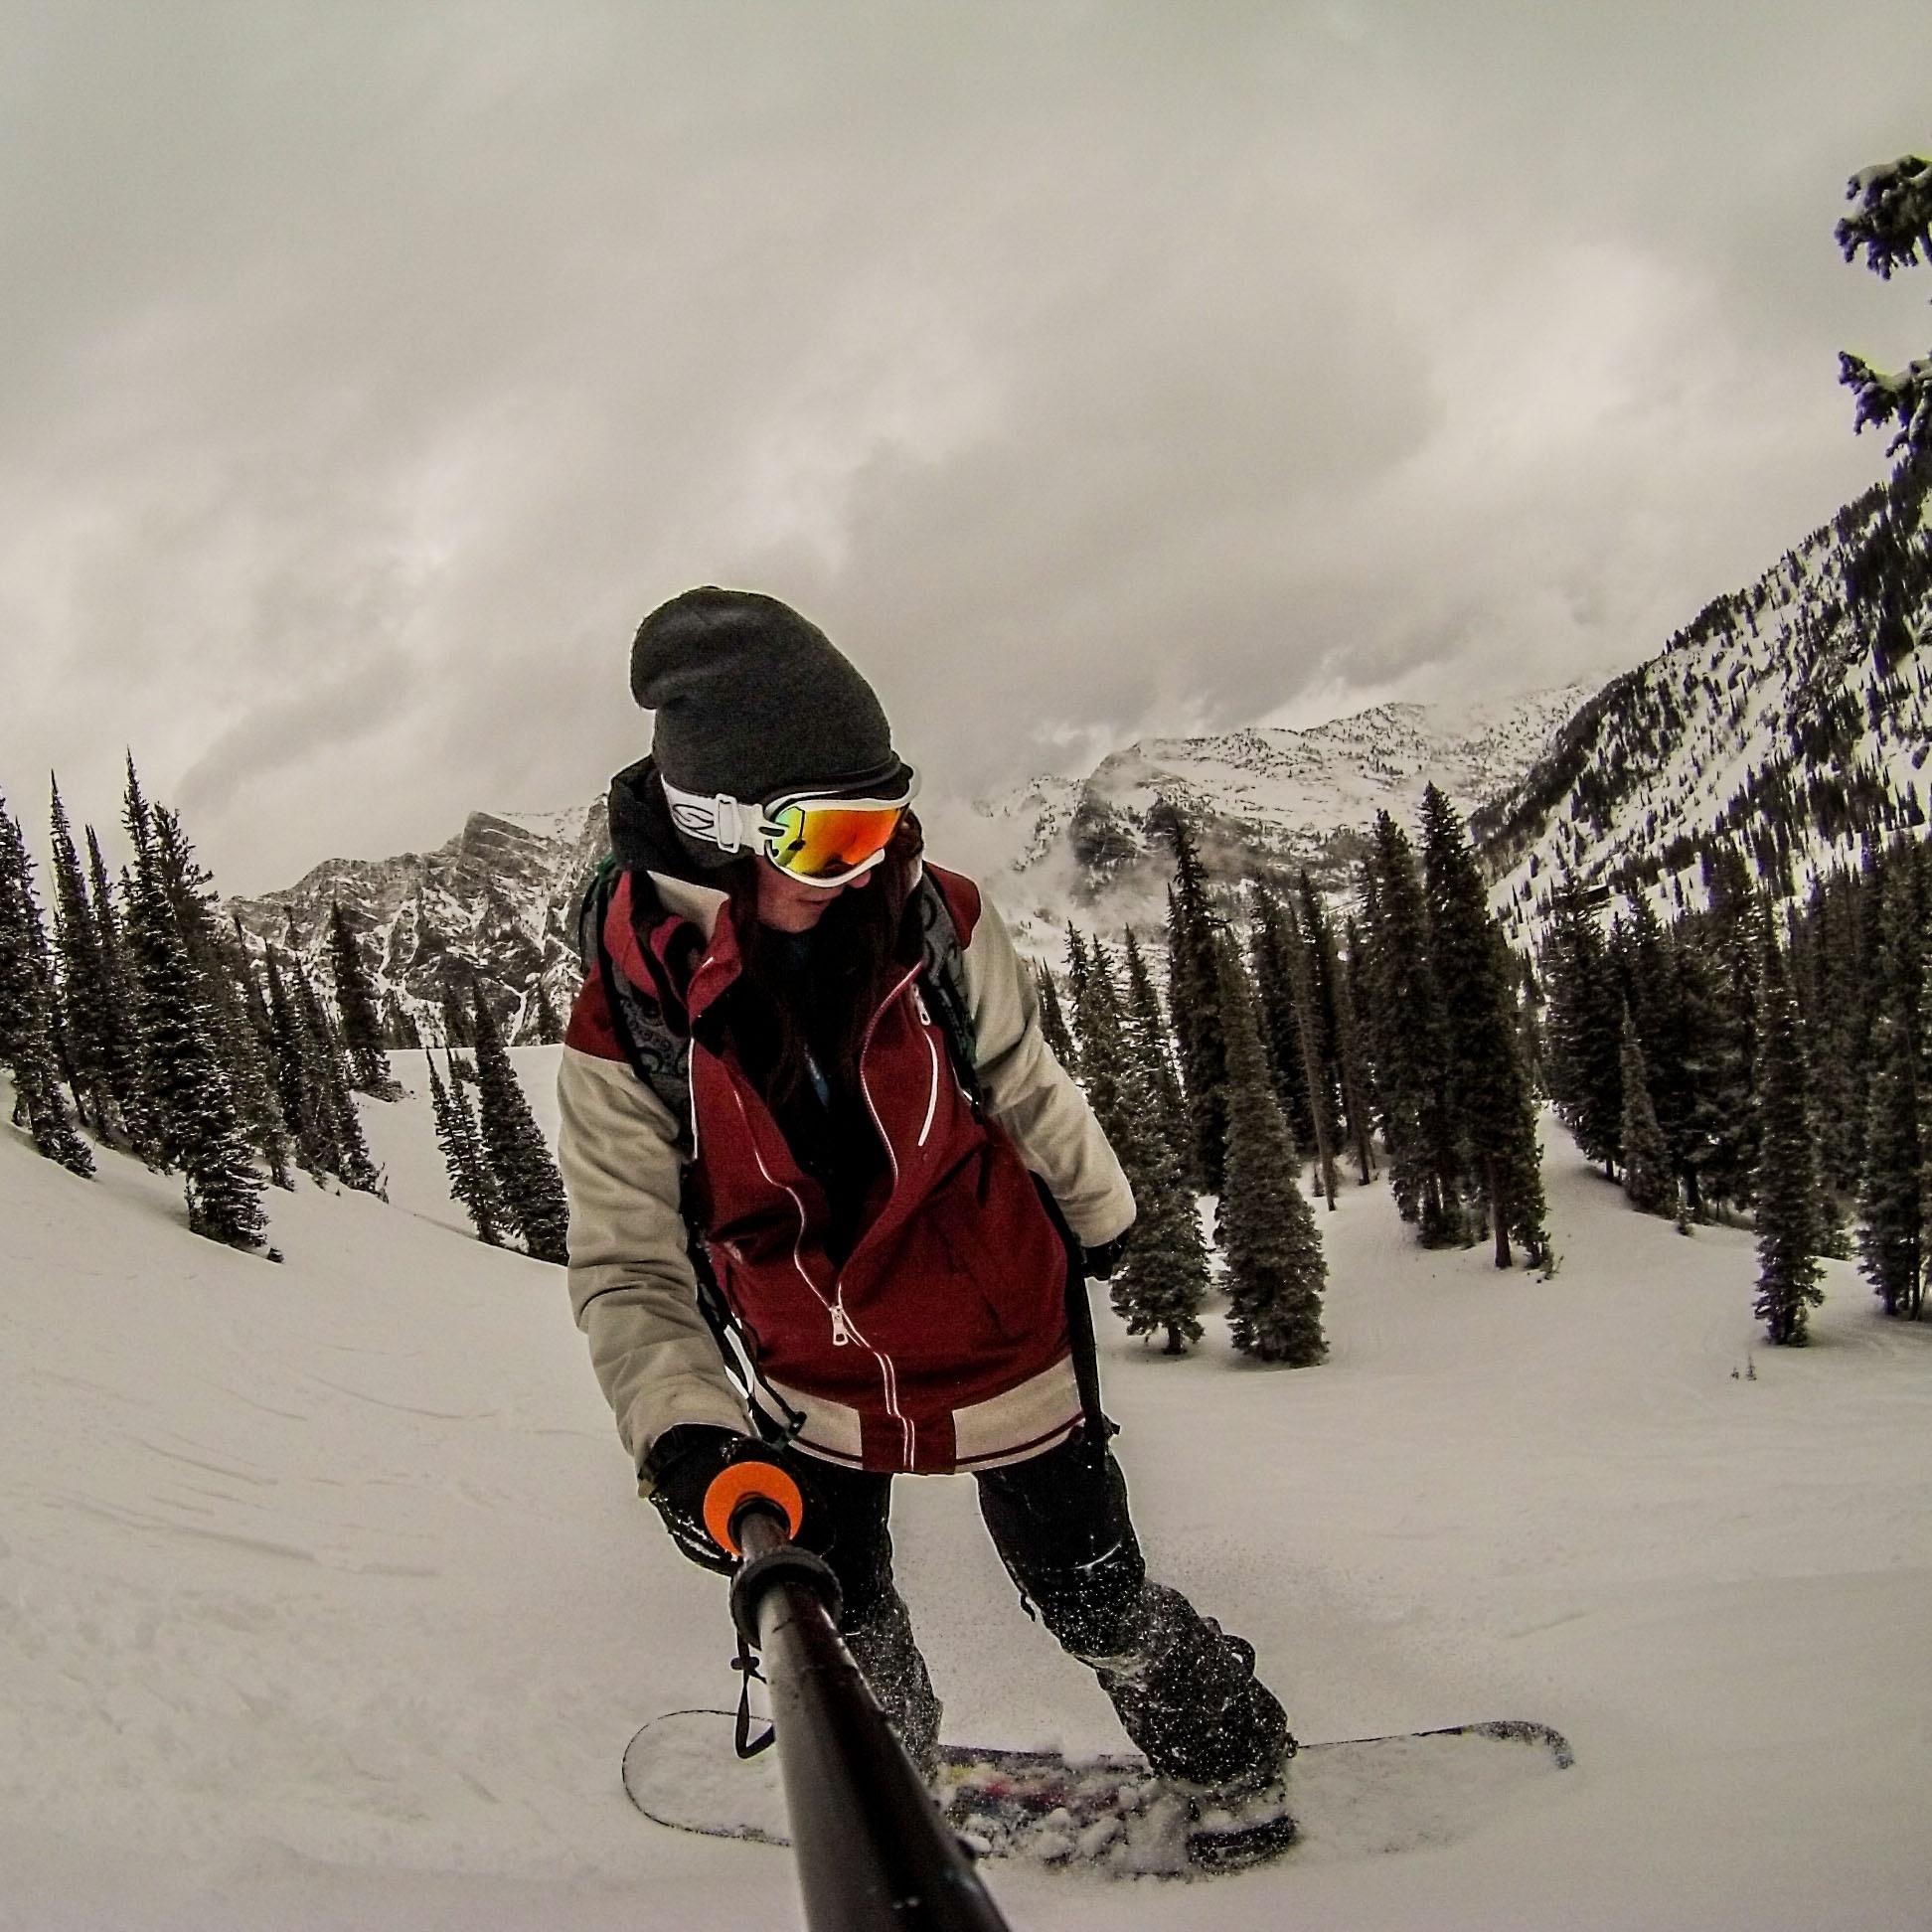 Snowboarding utah kasey crook thisworldexists